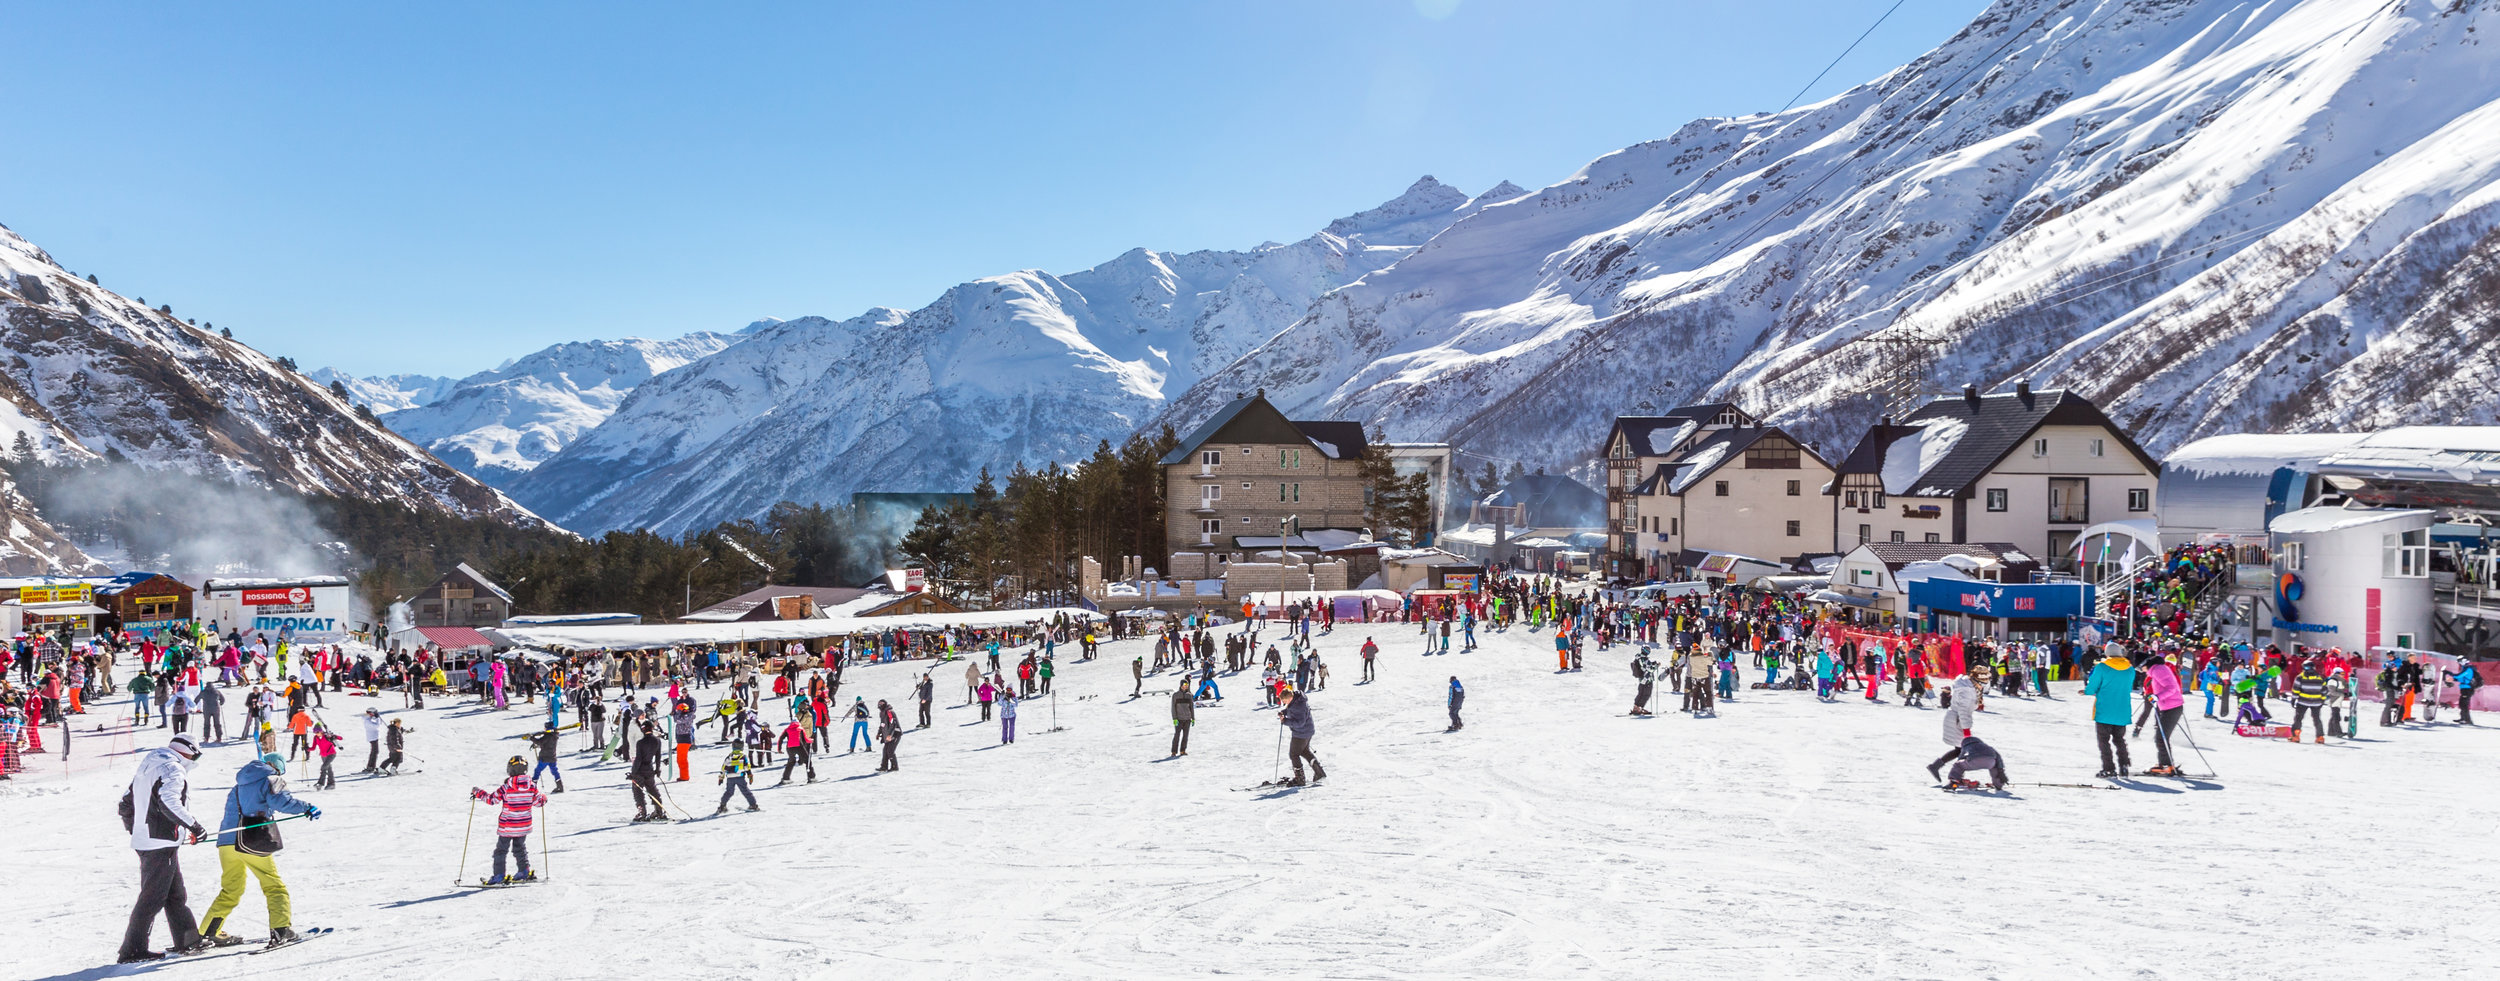 sustainable ski resort, ski resorts